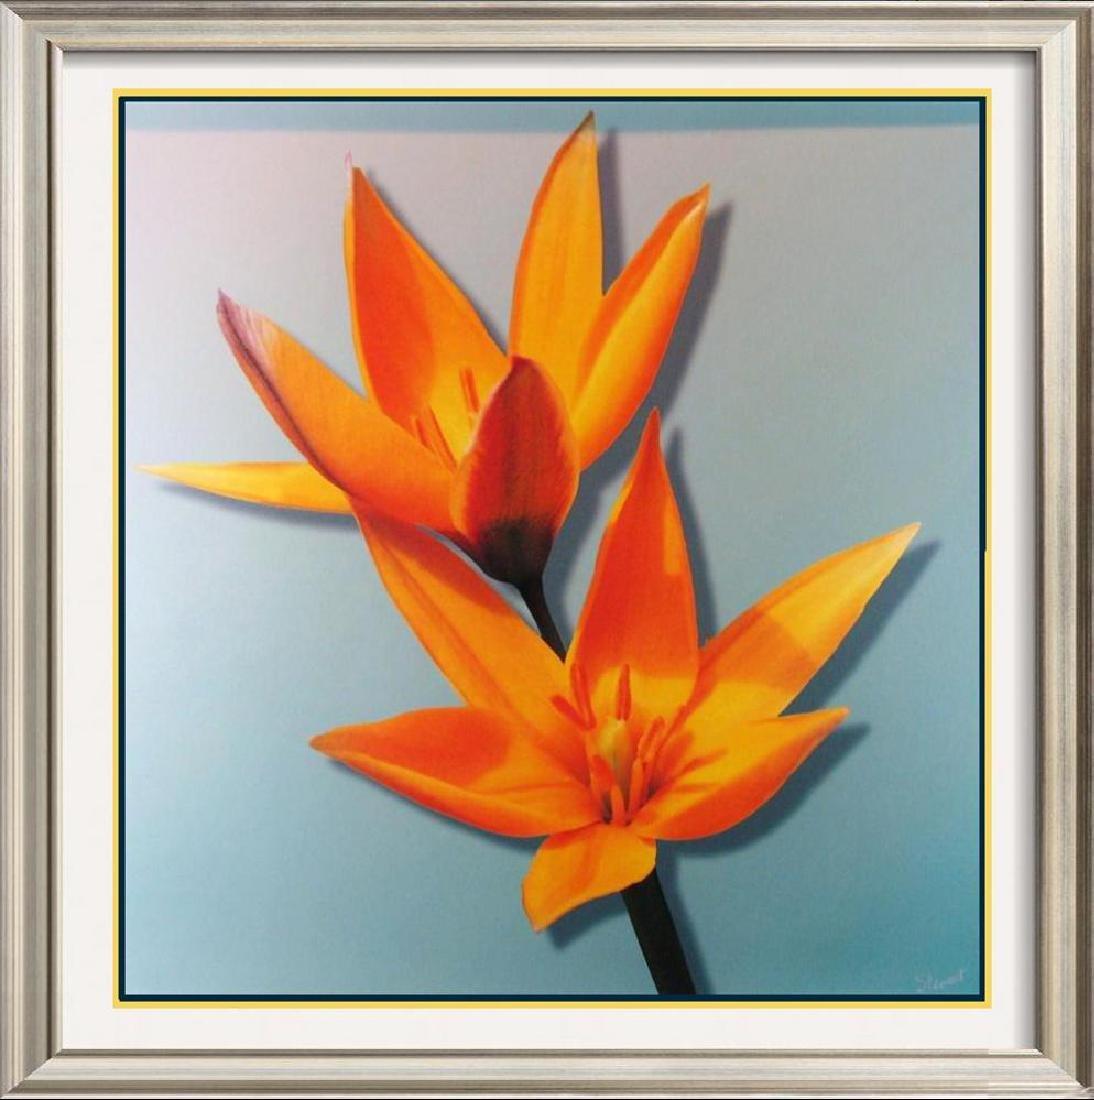 Canvas Giclee Fantastic Sale Colorful Best Art Deal